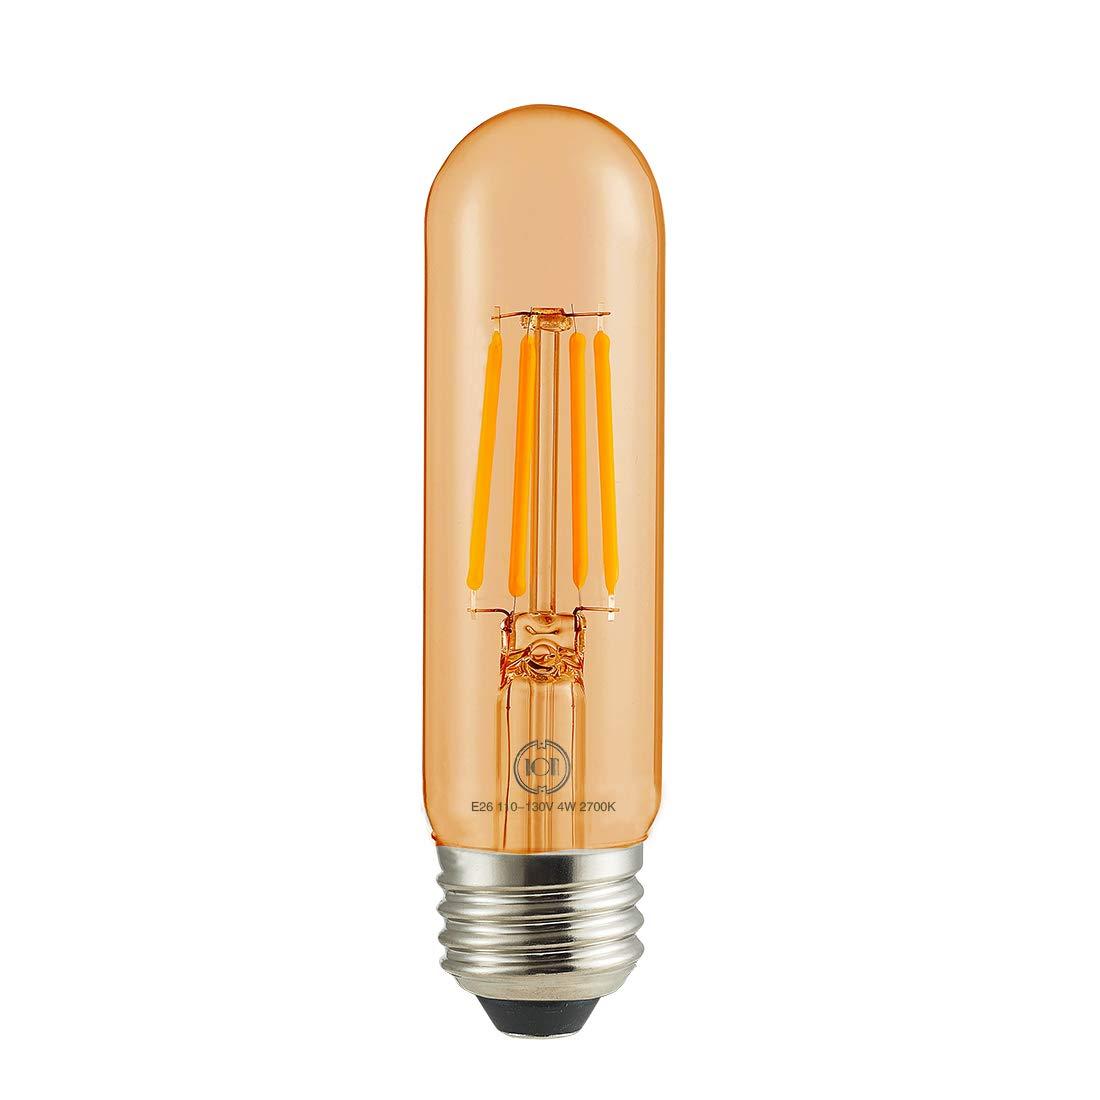 Led Filament Bulb Tubular Retro Vintage Edison T10 Style 40 Watt Incandescent Equivalent Warm Color Light 400 Lumens Dimmable E26 Medium Base Amber Color Glass, 4 Watt, Pack of 3